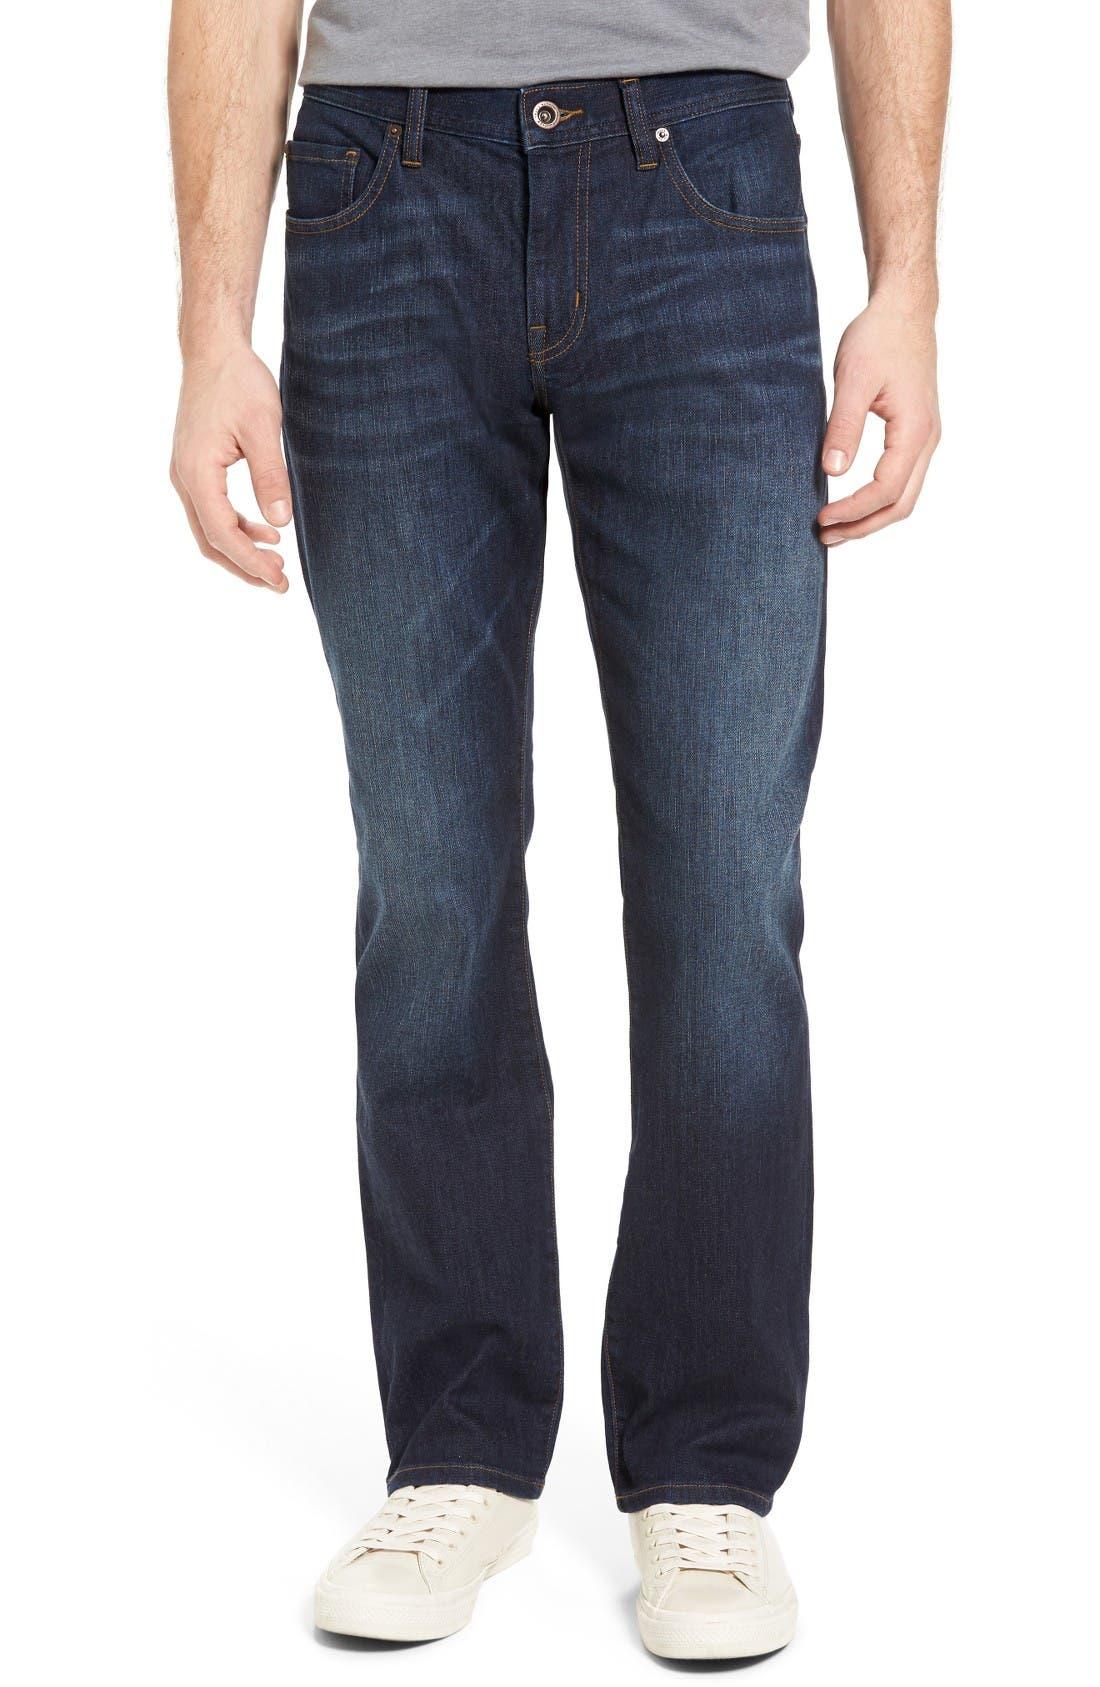 Alternate Image 1 Selected - Travis Mathew 'Duke' Relaxed Fit Jeans (Vintage Indigo)